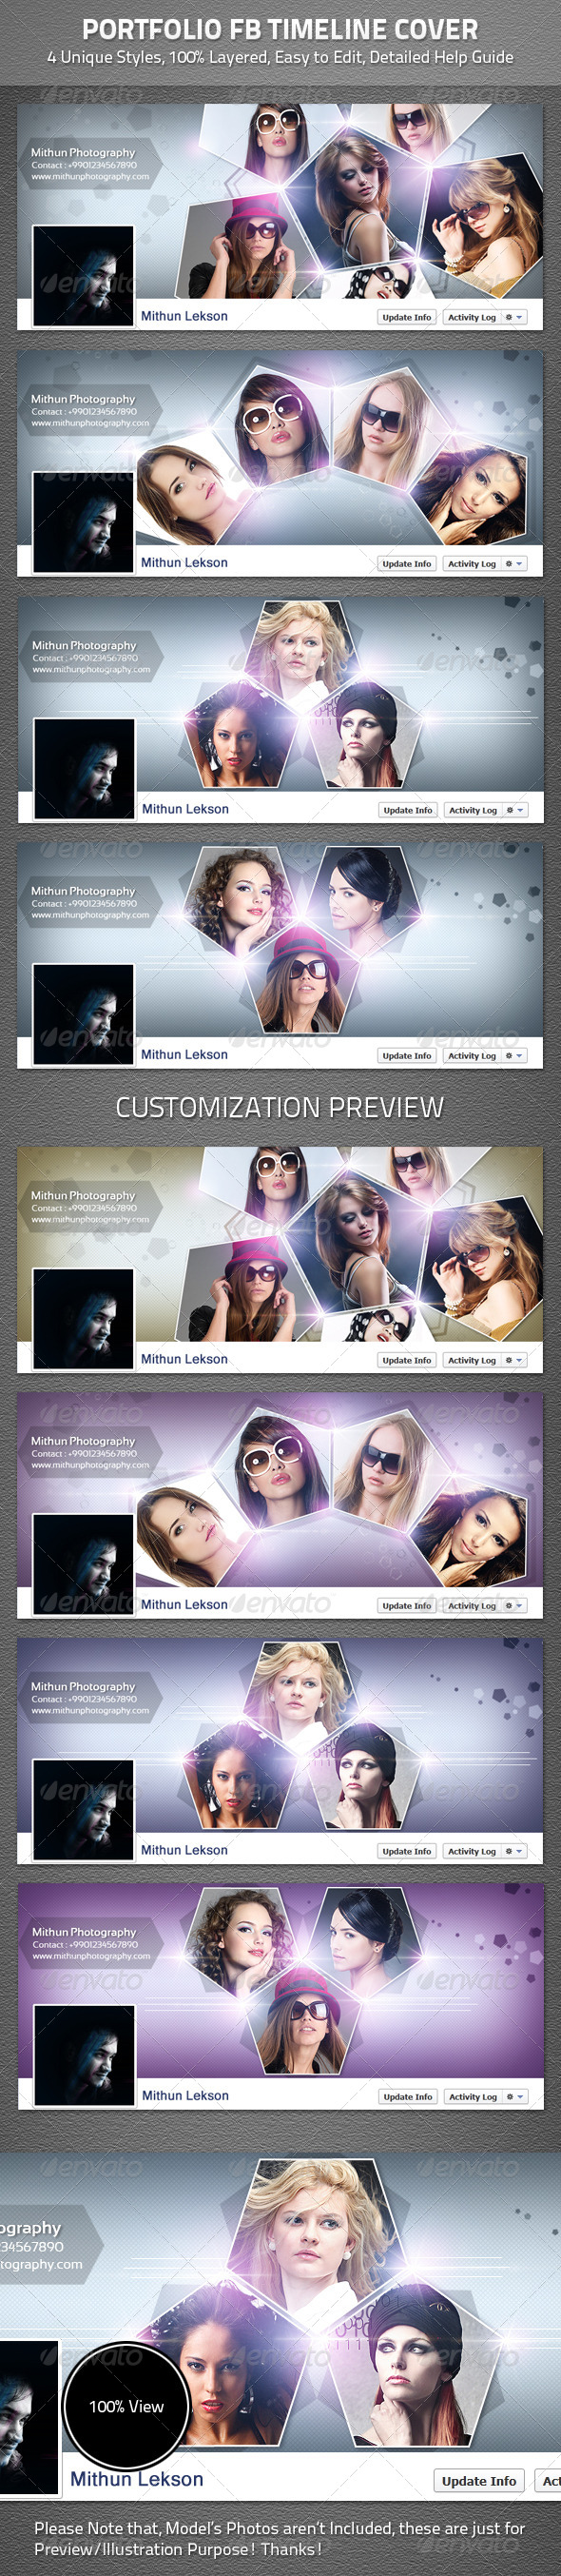 Portfolio FBTimeline Cover - Facebook Timeline Covers Social Media